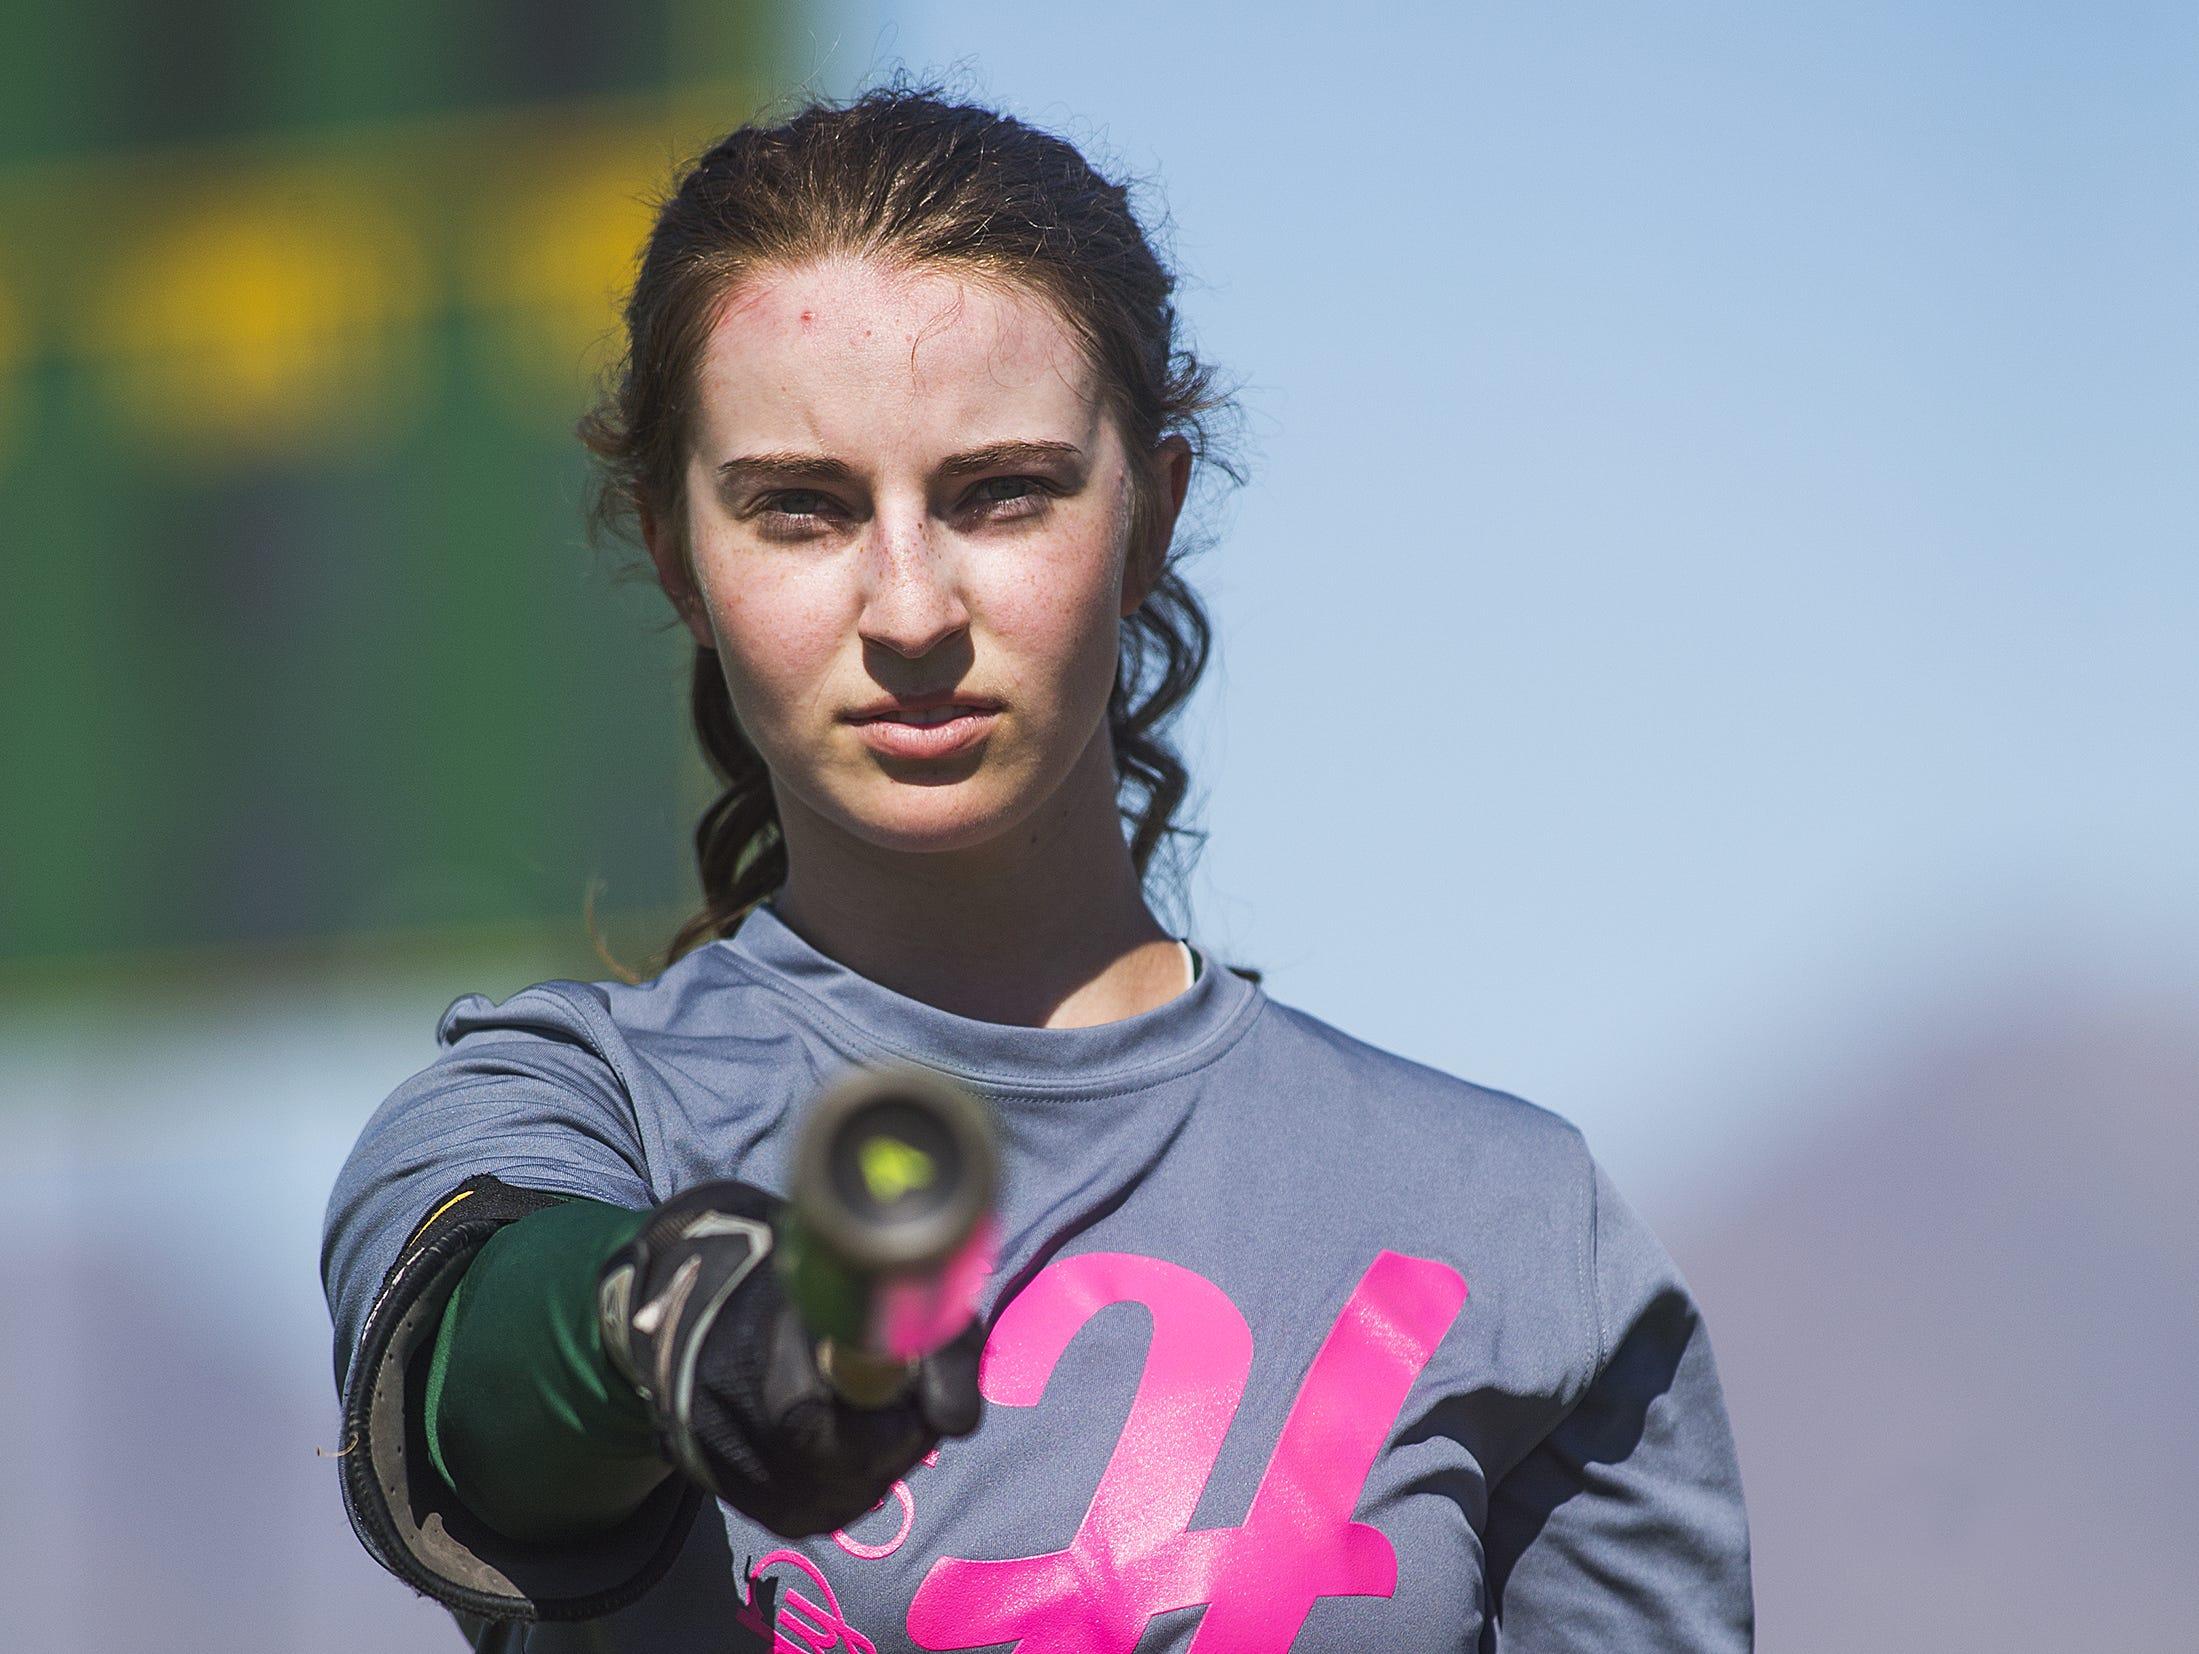 Tamara Statman poses at practice at Horizon High School in Phoenix, Wednesday, April 29, 2015.